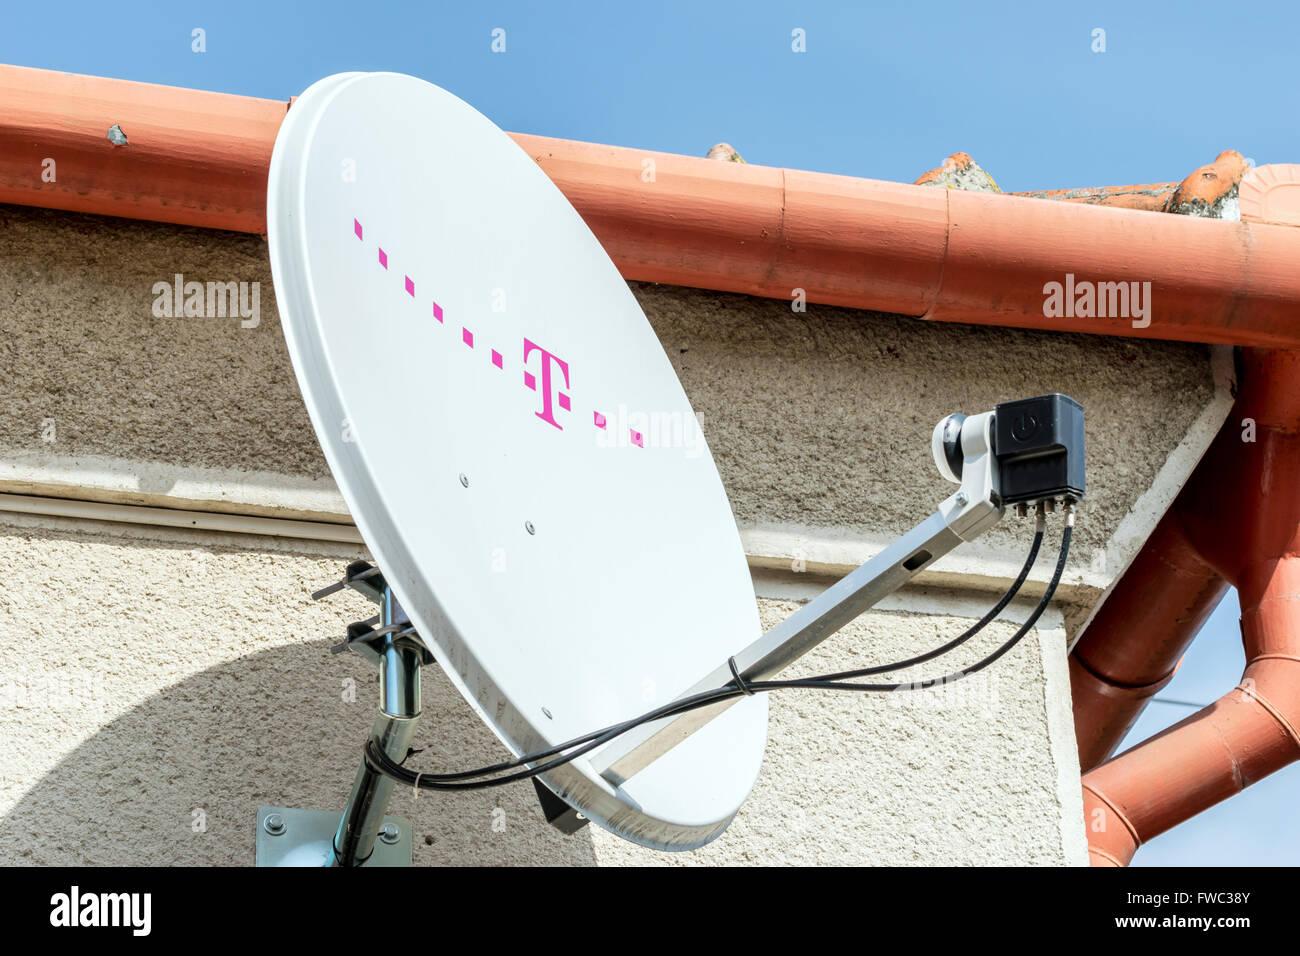 Telekom T Com T Mobile Satellitenschüssel Stockfoto Bild